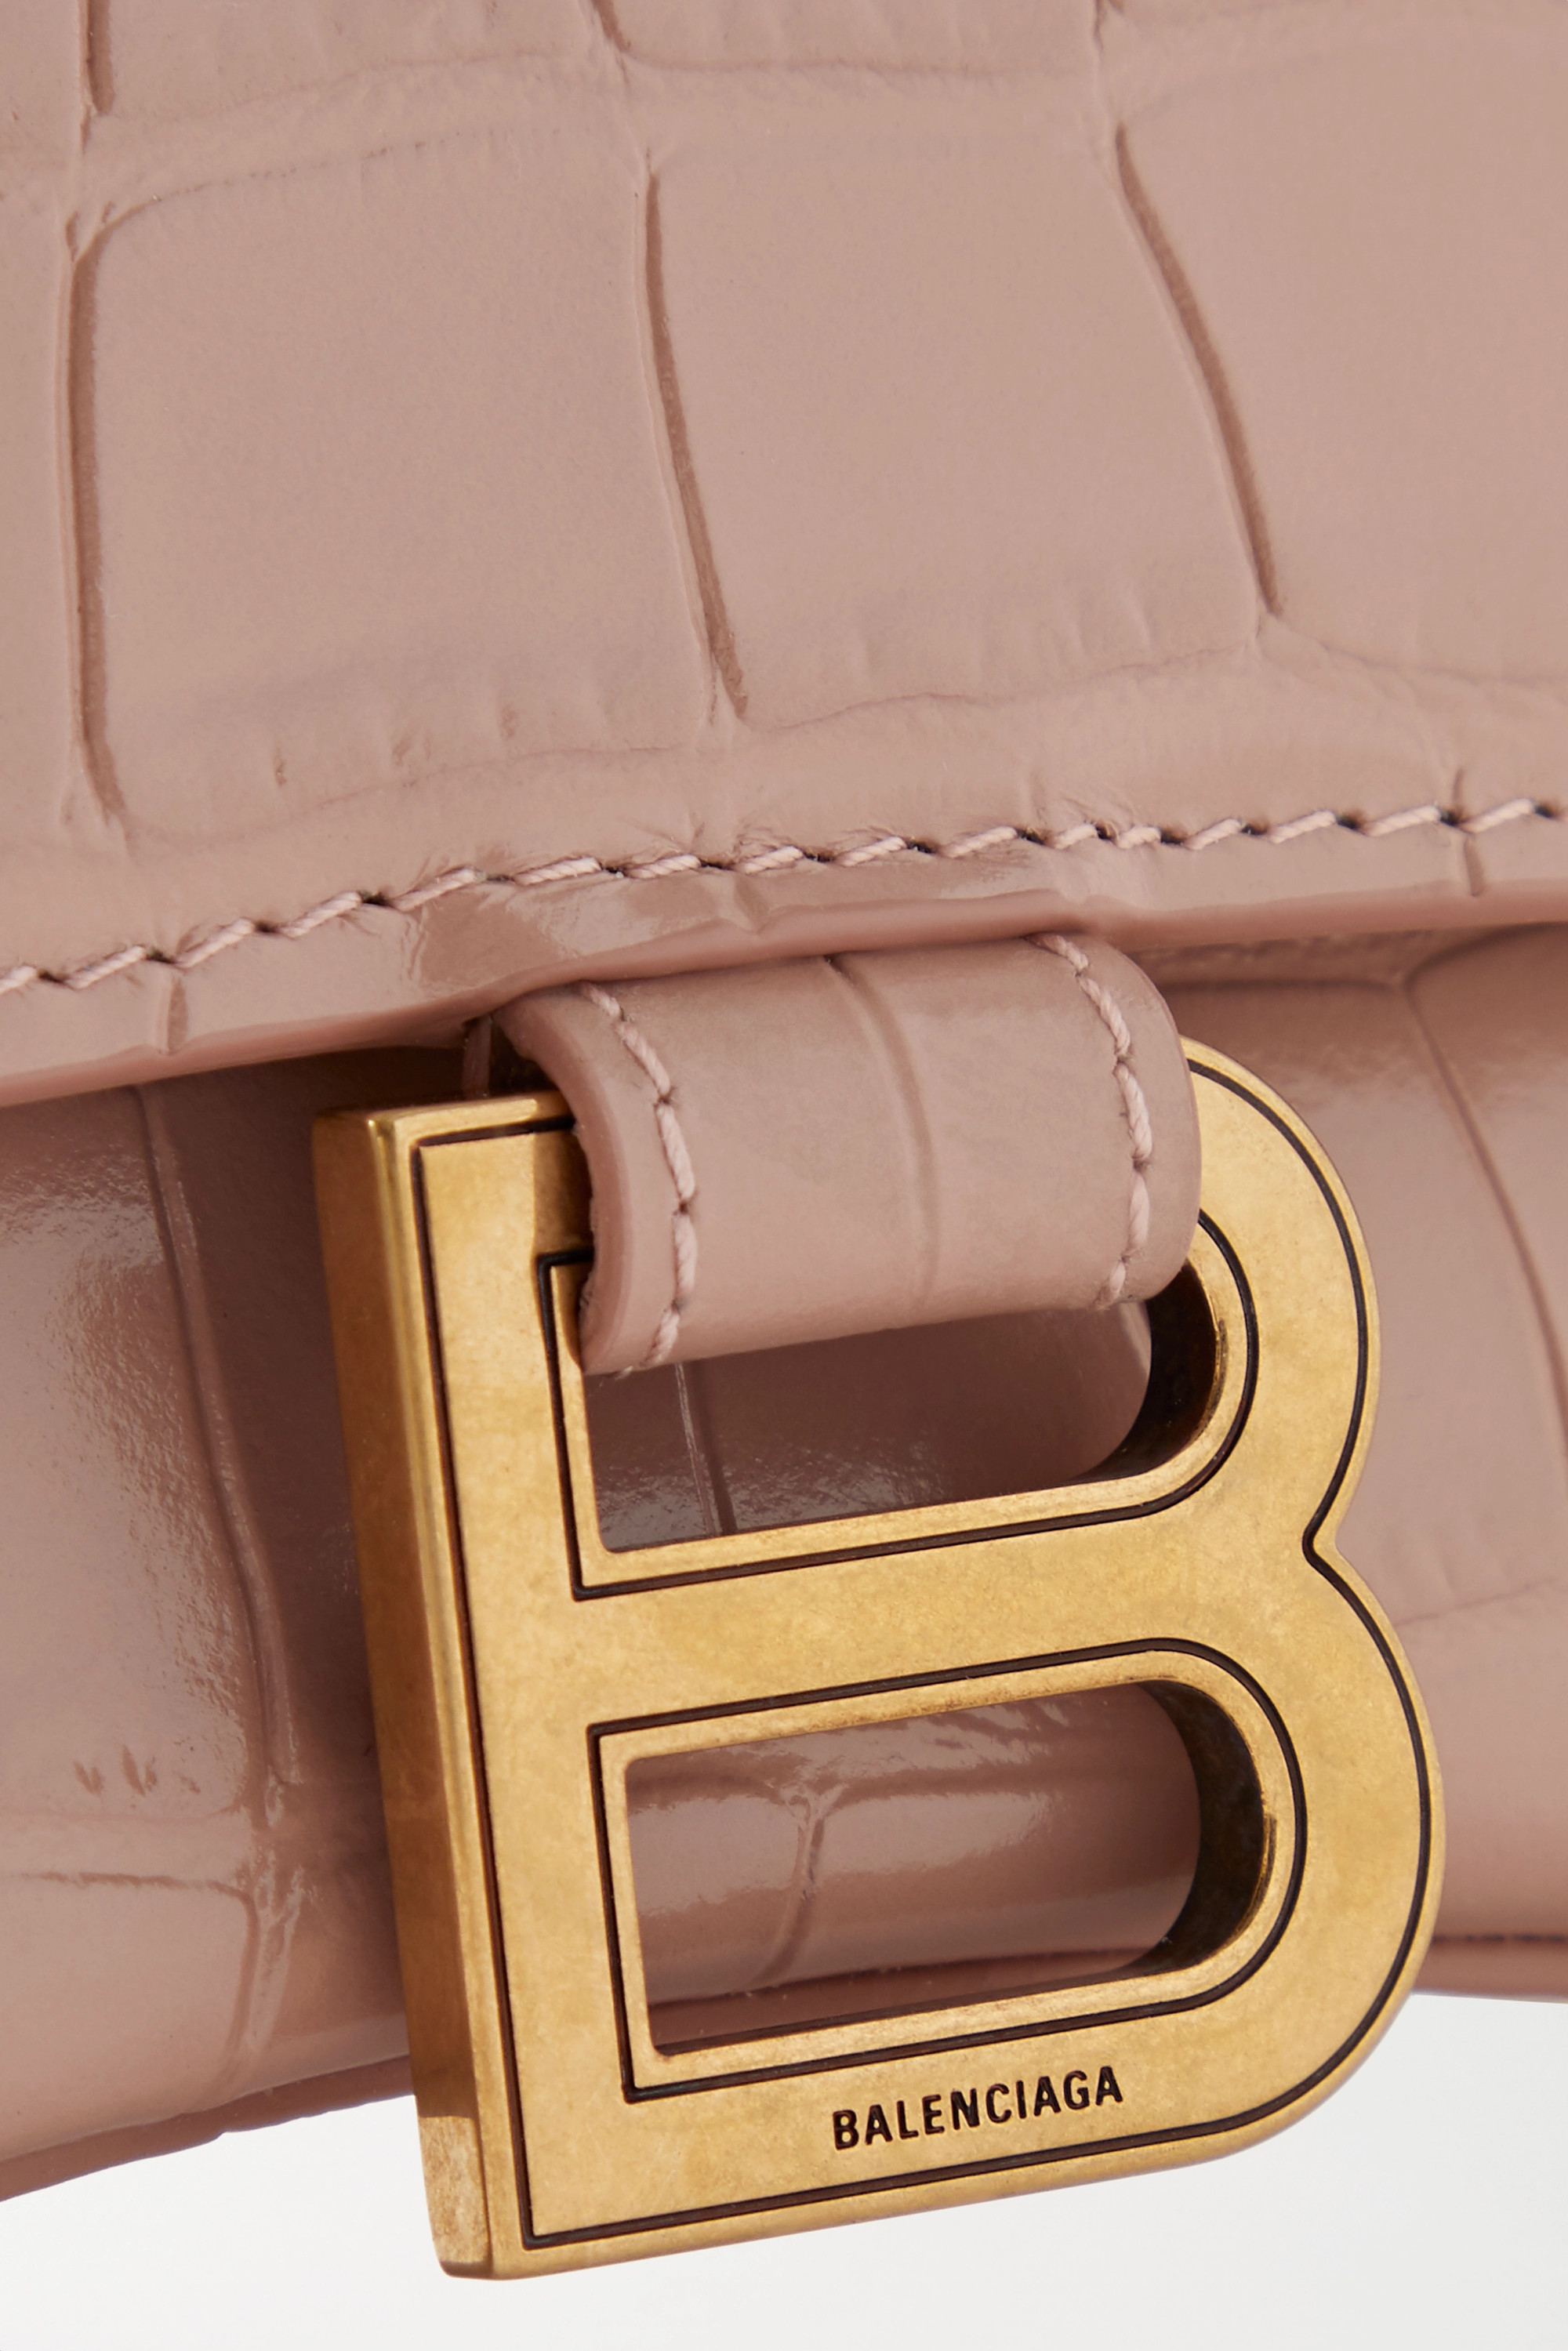 Balenciaga Hourglass small croc-effect leather tote